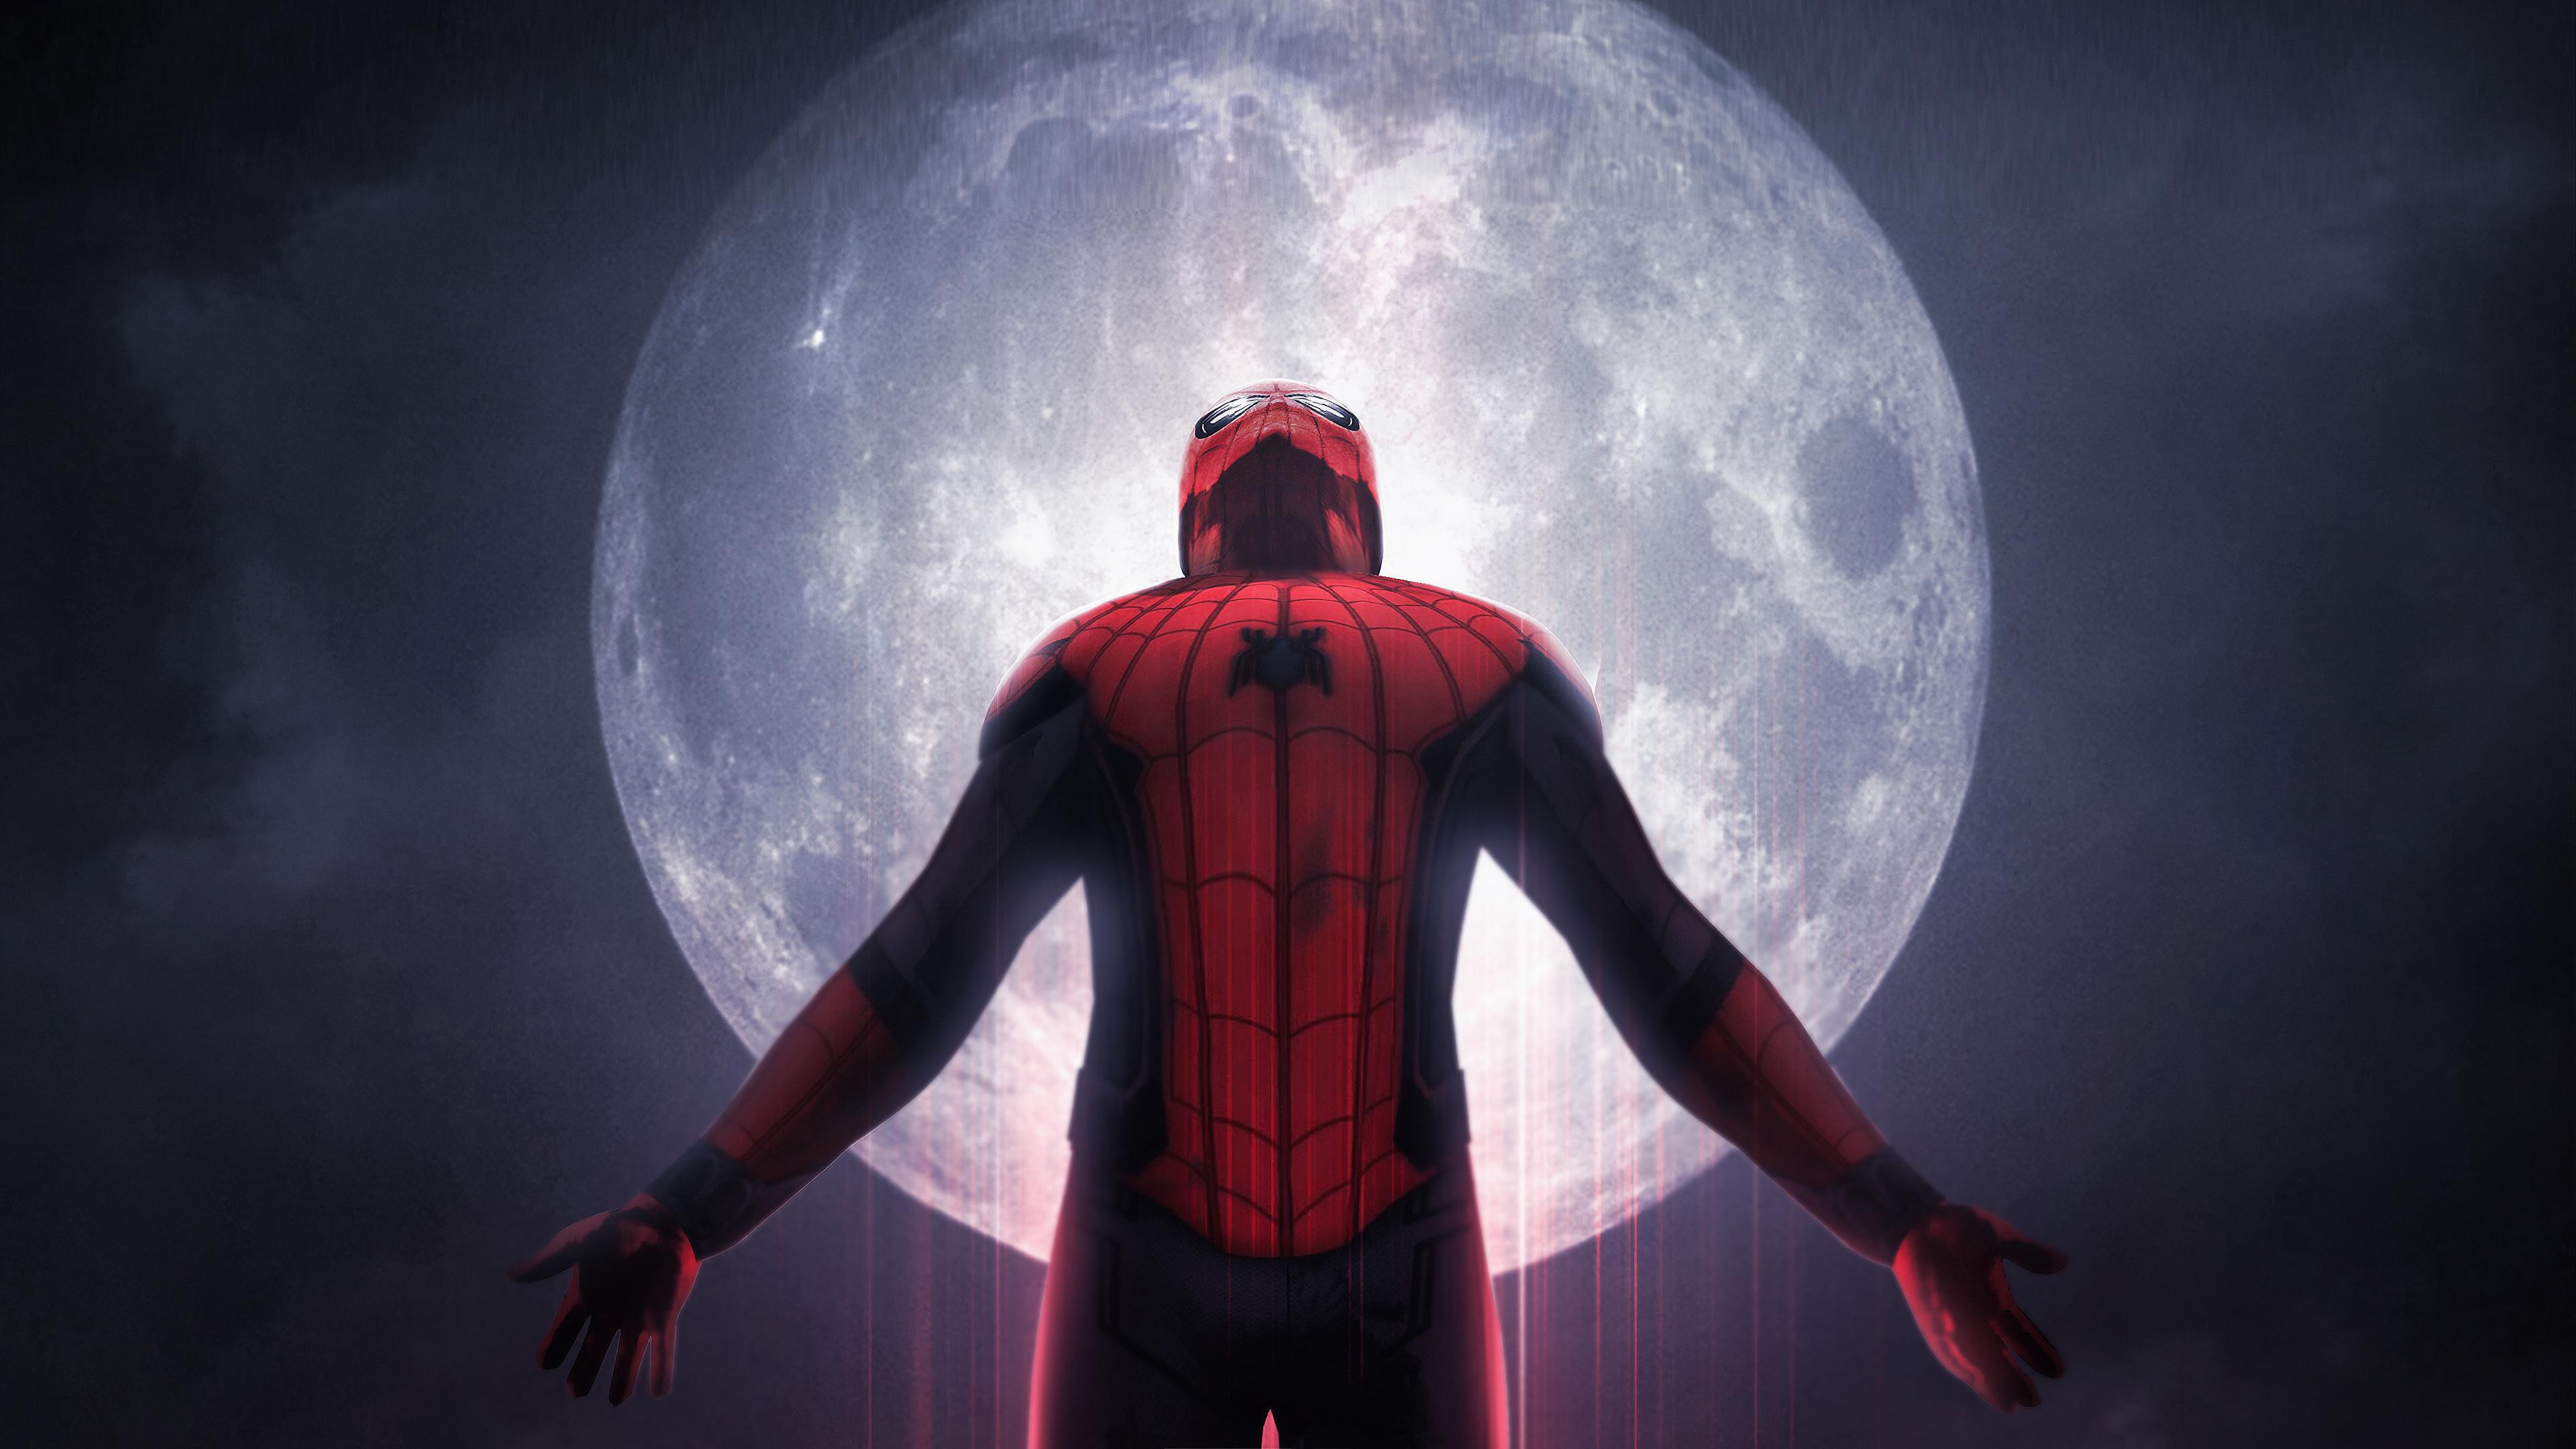 Wallpaper 4k Spiderman Far From Home Art 4k 4k Wallpapers